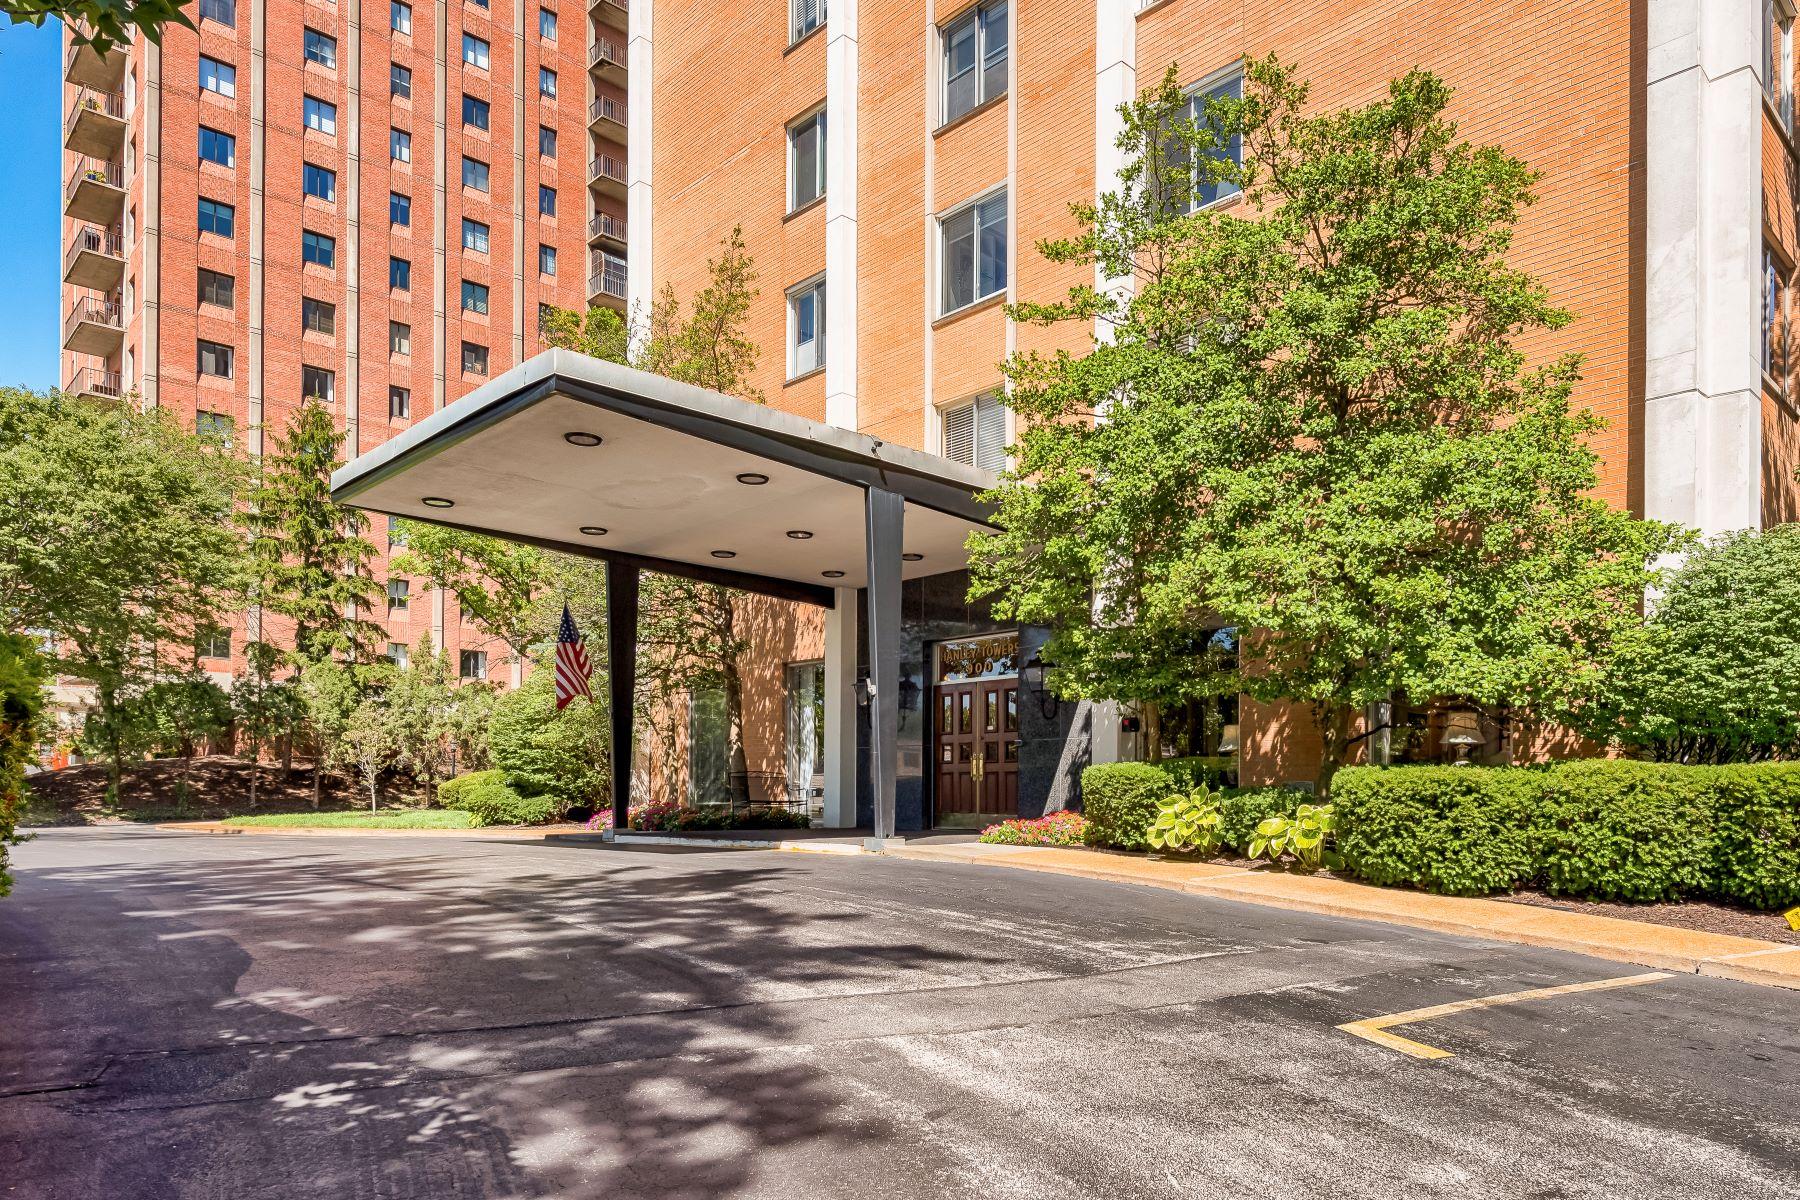 Condominiums for Sale at Charming Clayton Condo 900 South Hanley Road #8B Clayton, Missouri 63105 United States